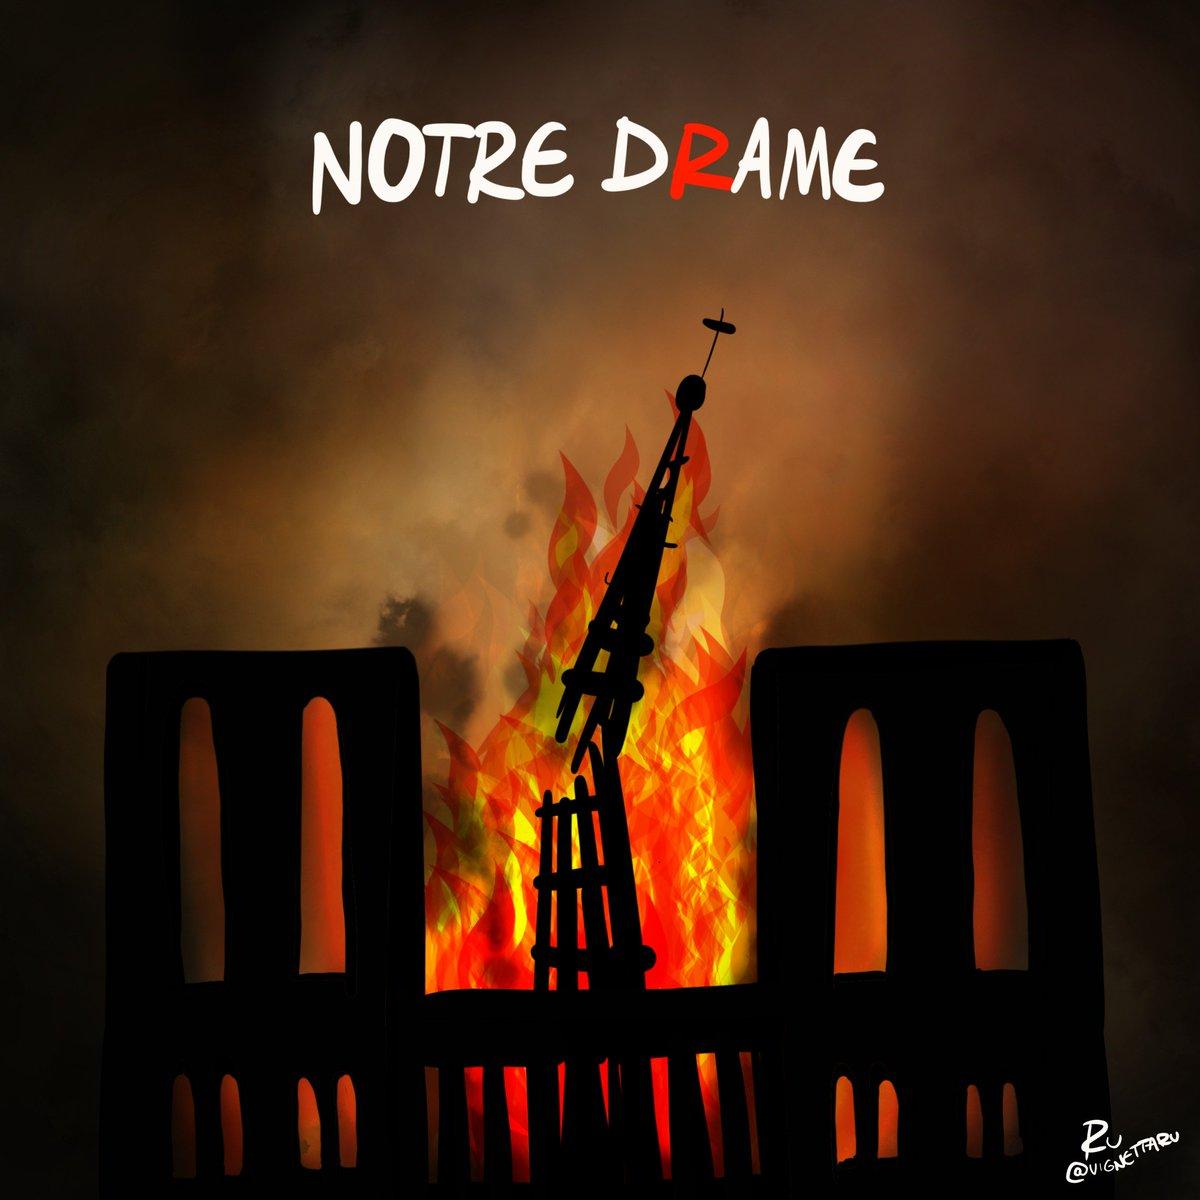 NOTRE-DRAME  #NodreDameDeParis #NotreDame #NotreDameCathedralFire #15aprile #16aprile<br>http://pic.twitter.com/0CiaqS8pYc